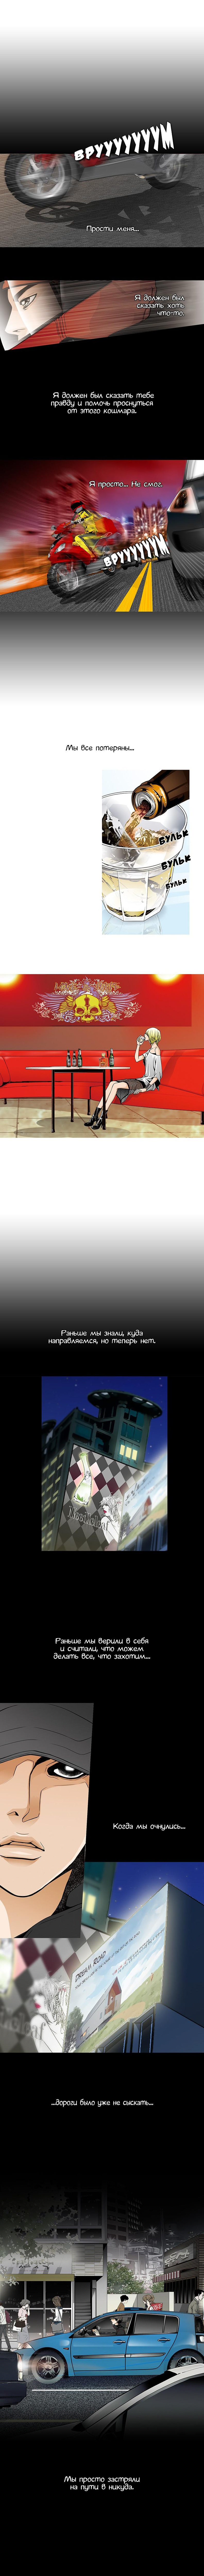 https://r1.ninemanga.com/comics/pic2/29/28573/344315/1512078117716.jpg Page 2